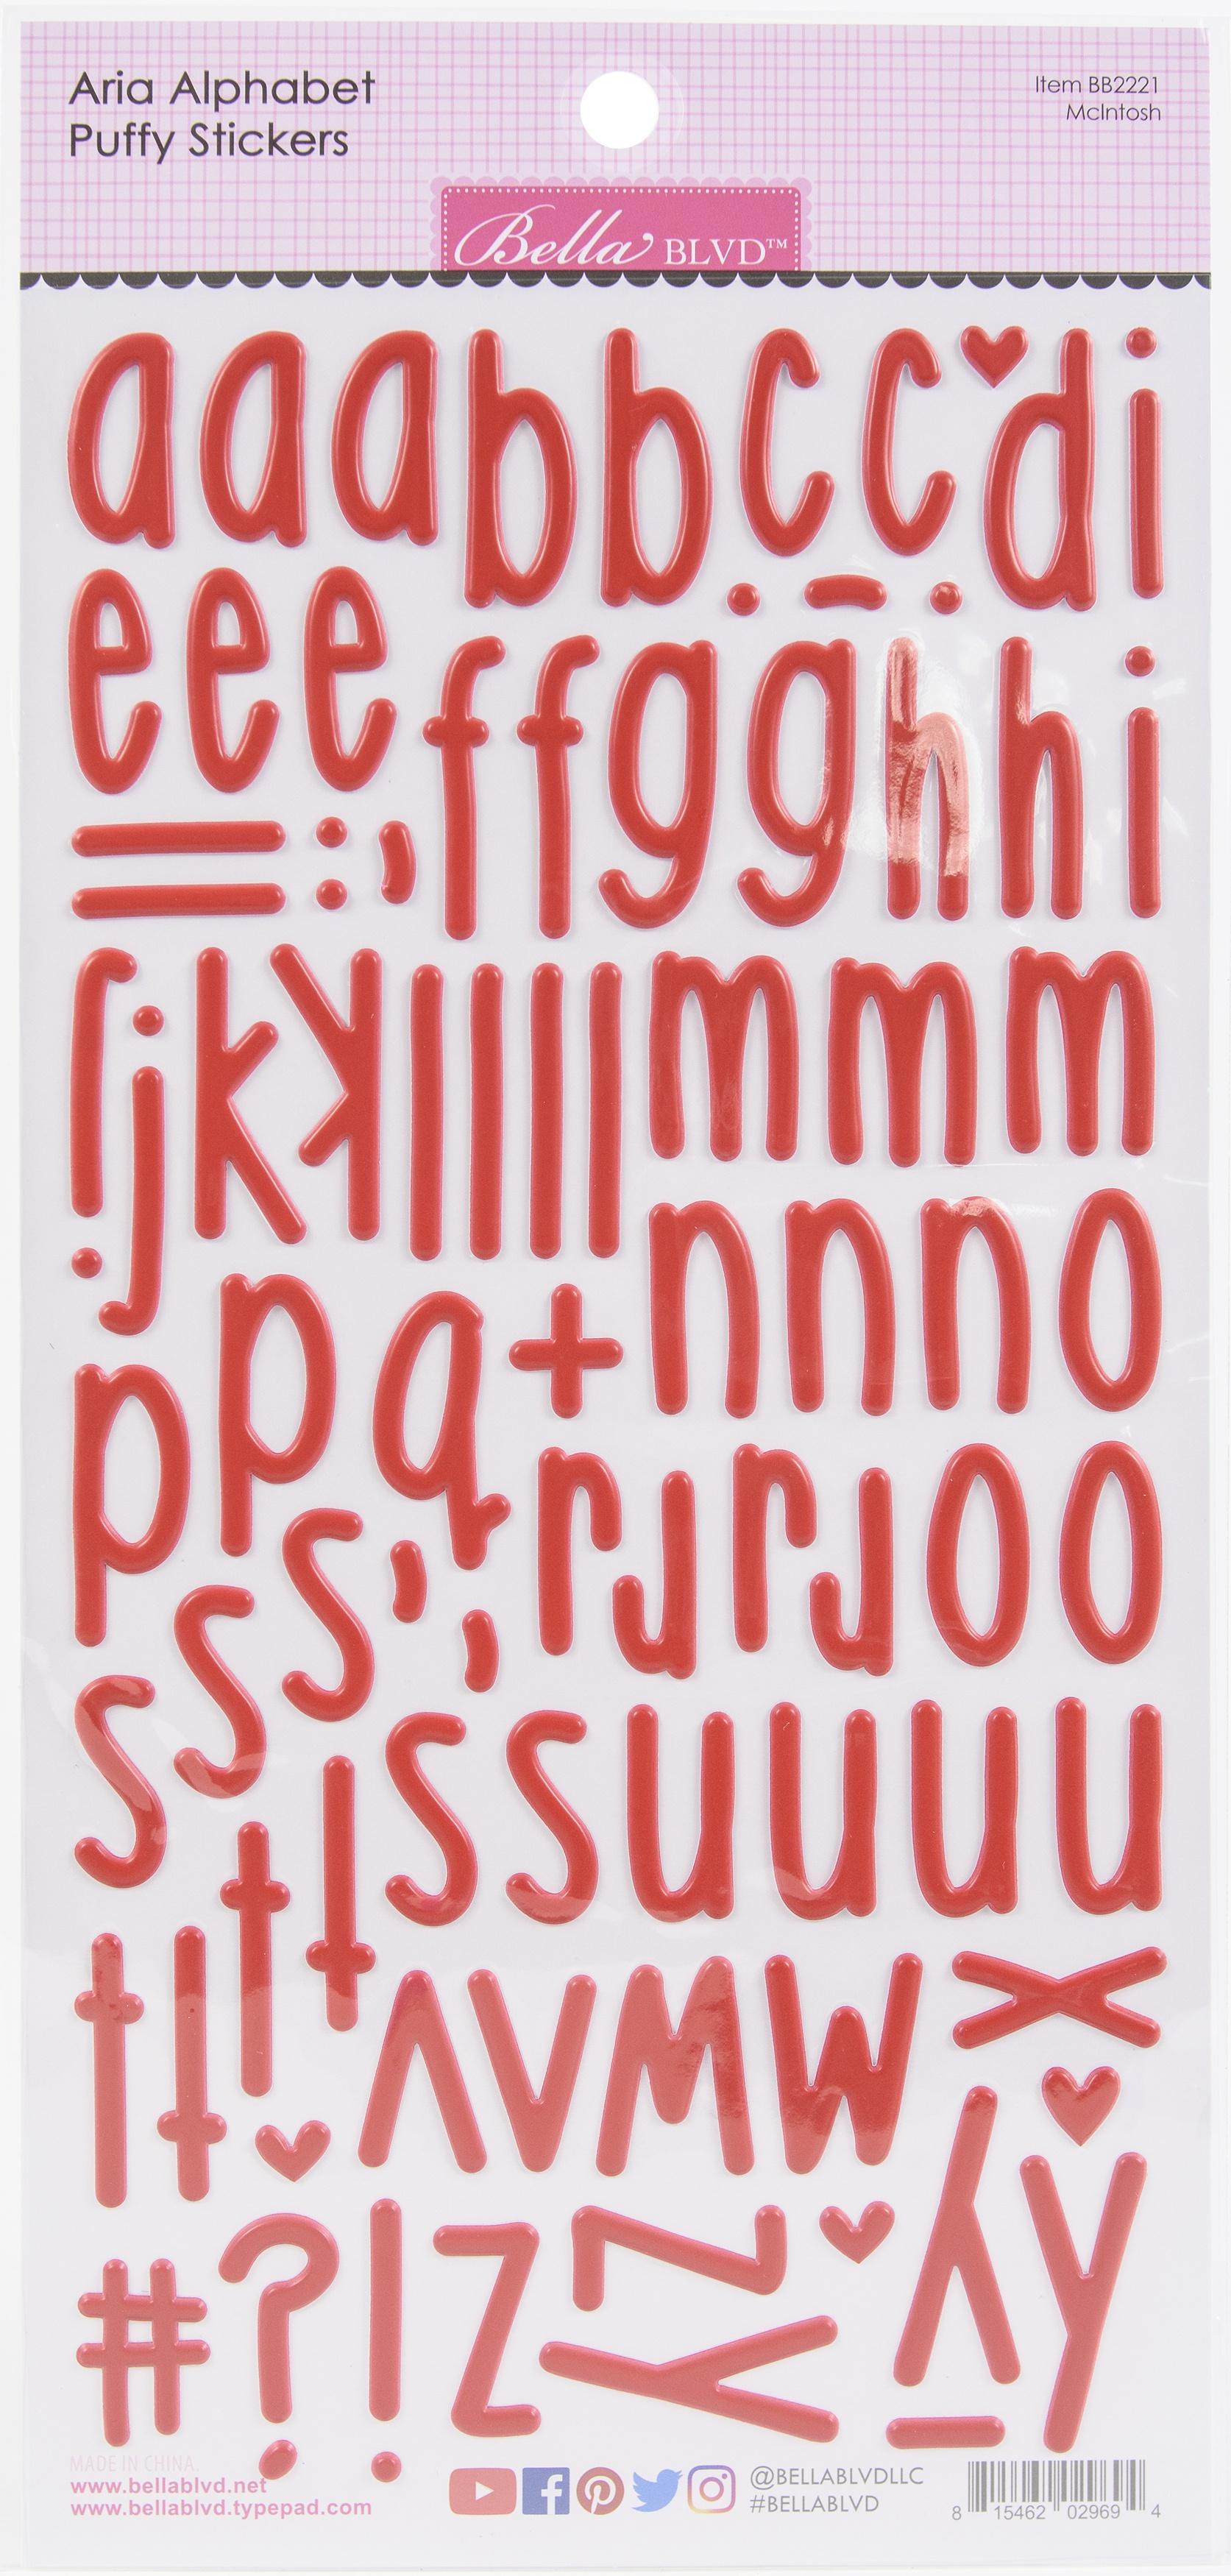 Aria Alpha Puffy Stickers-McIntosh